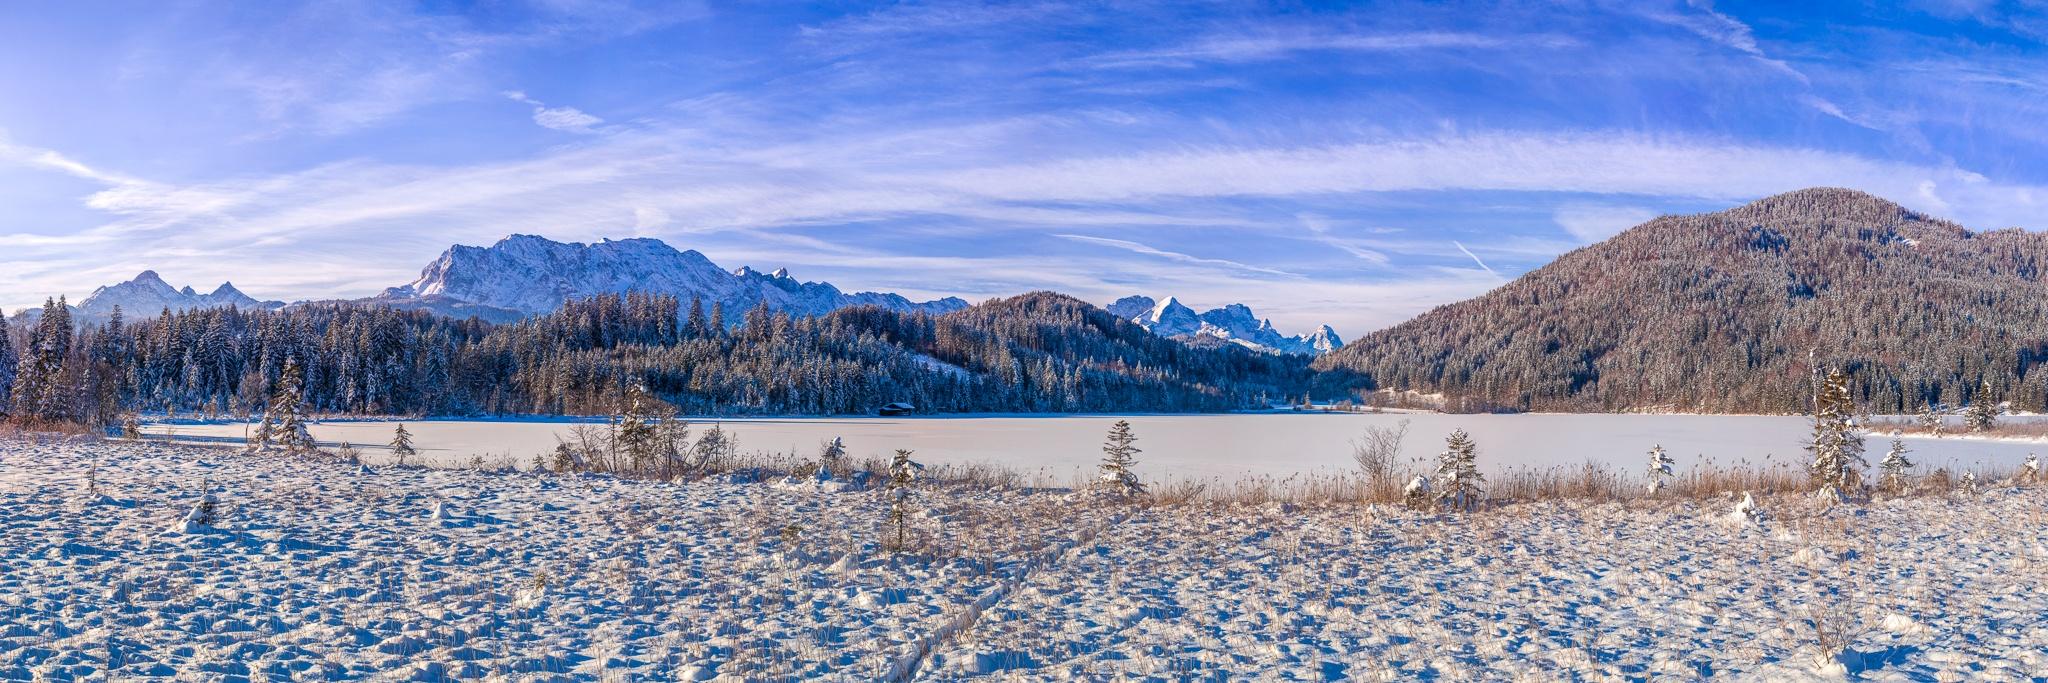 Barmsee, Winter, Schnee